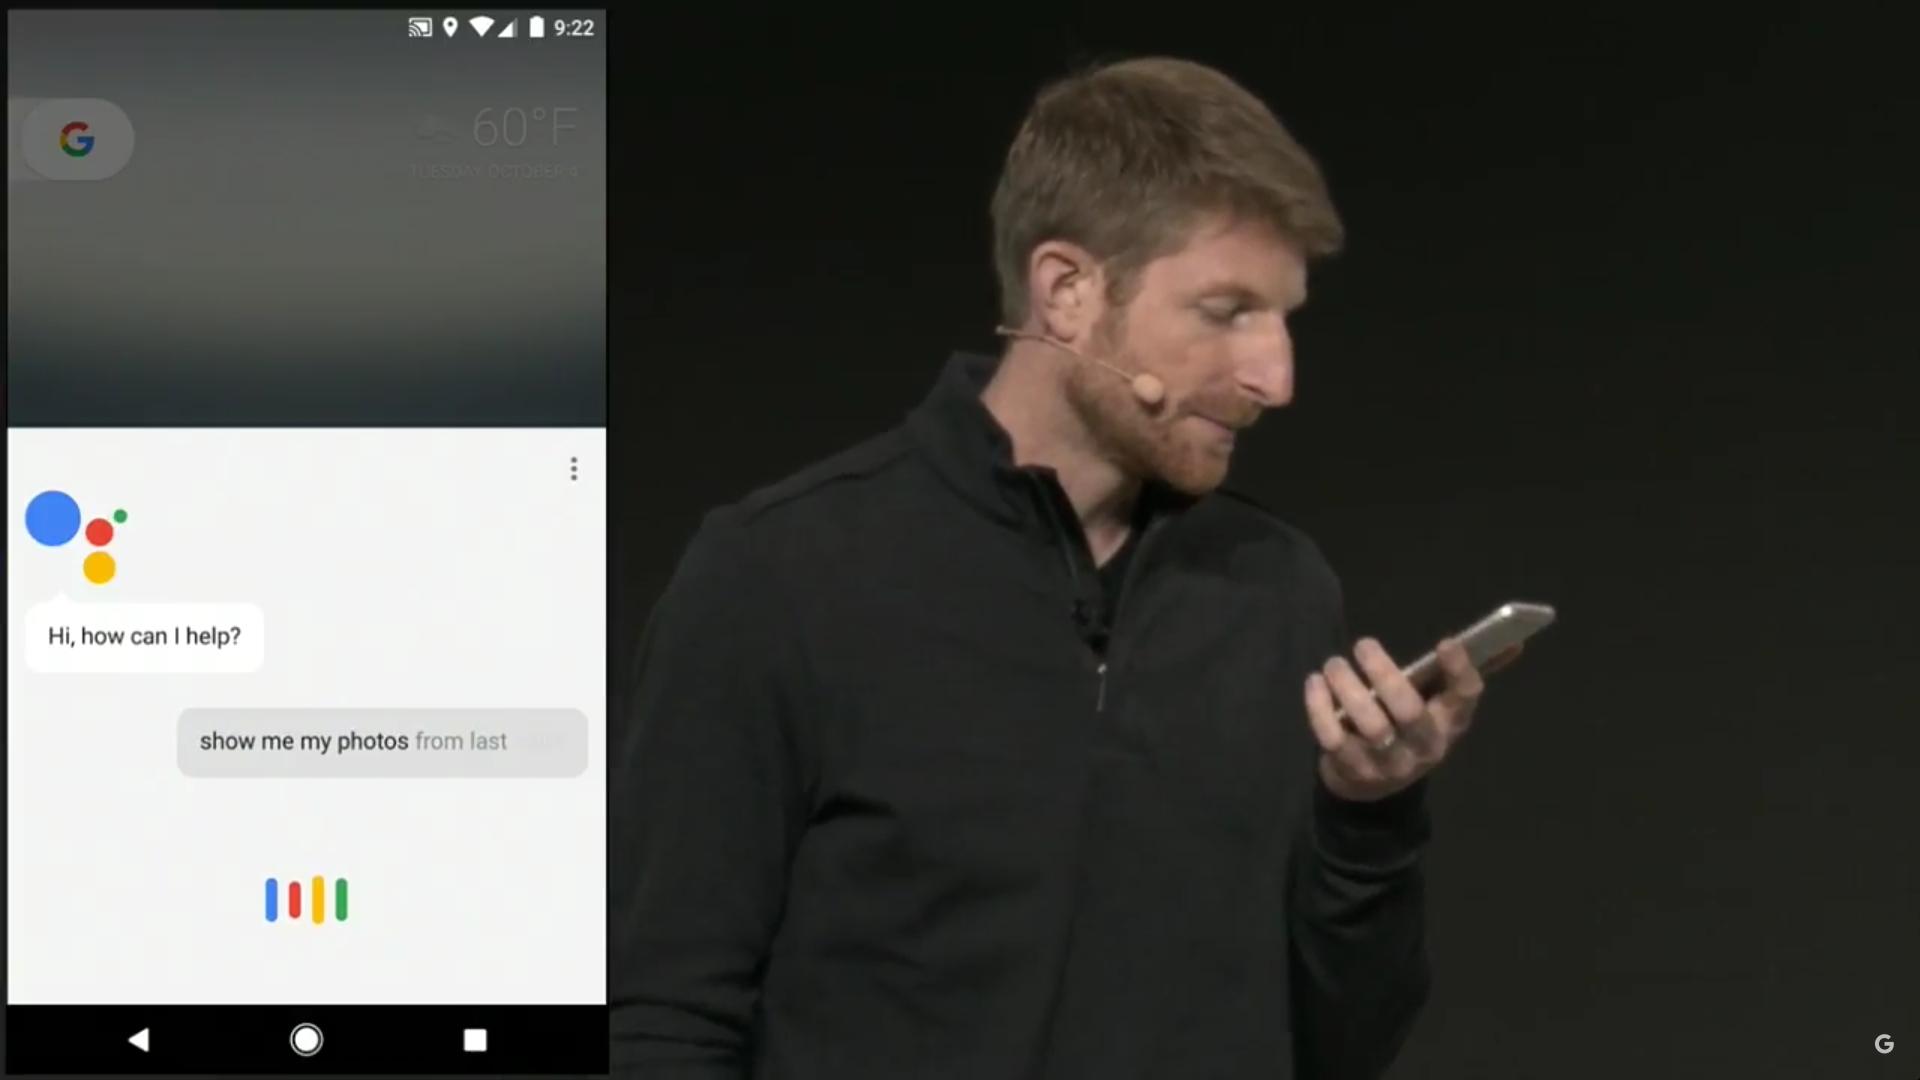 brian rakowski assistant demo -Google 2016